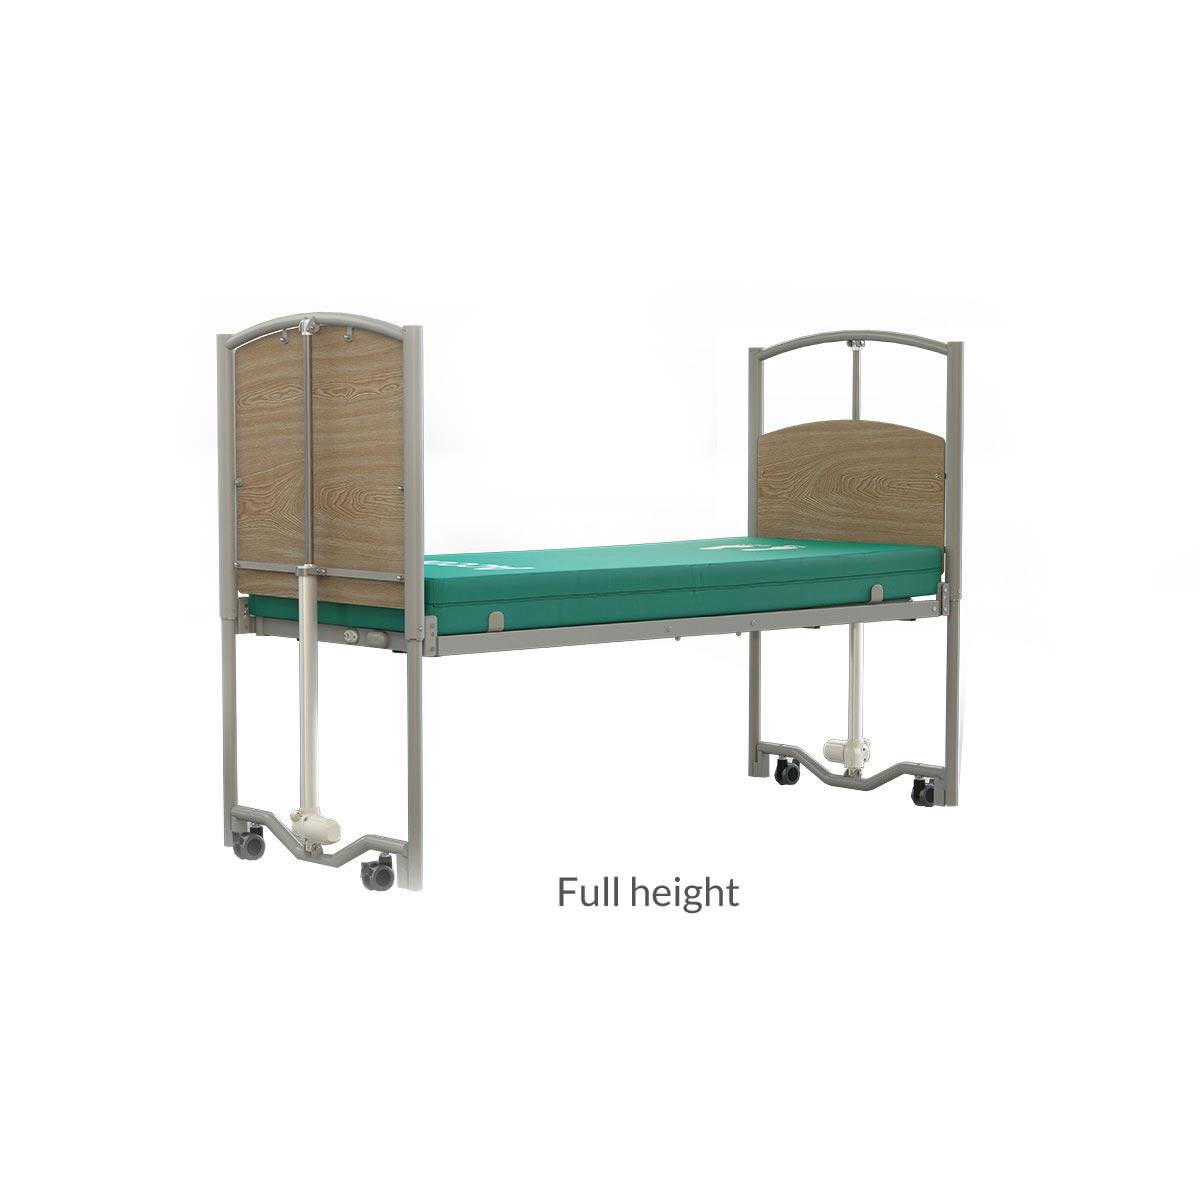 Accora FloorBed 1 - Full height